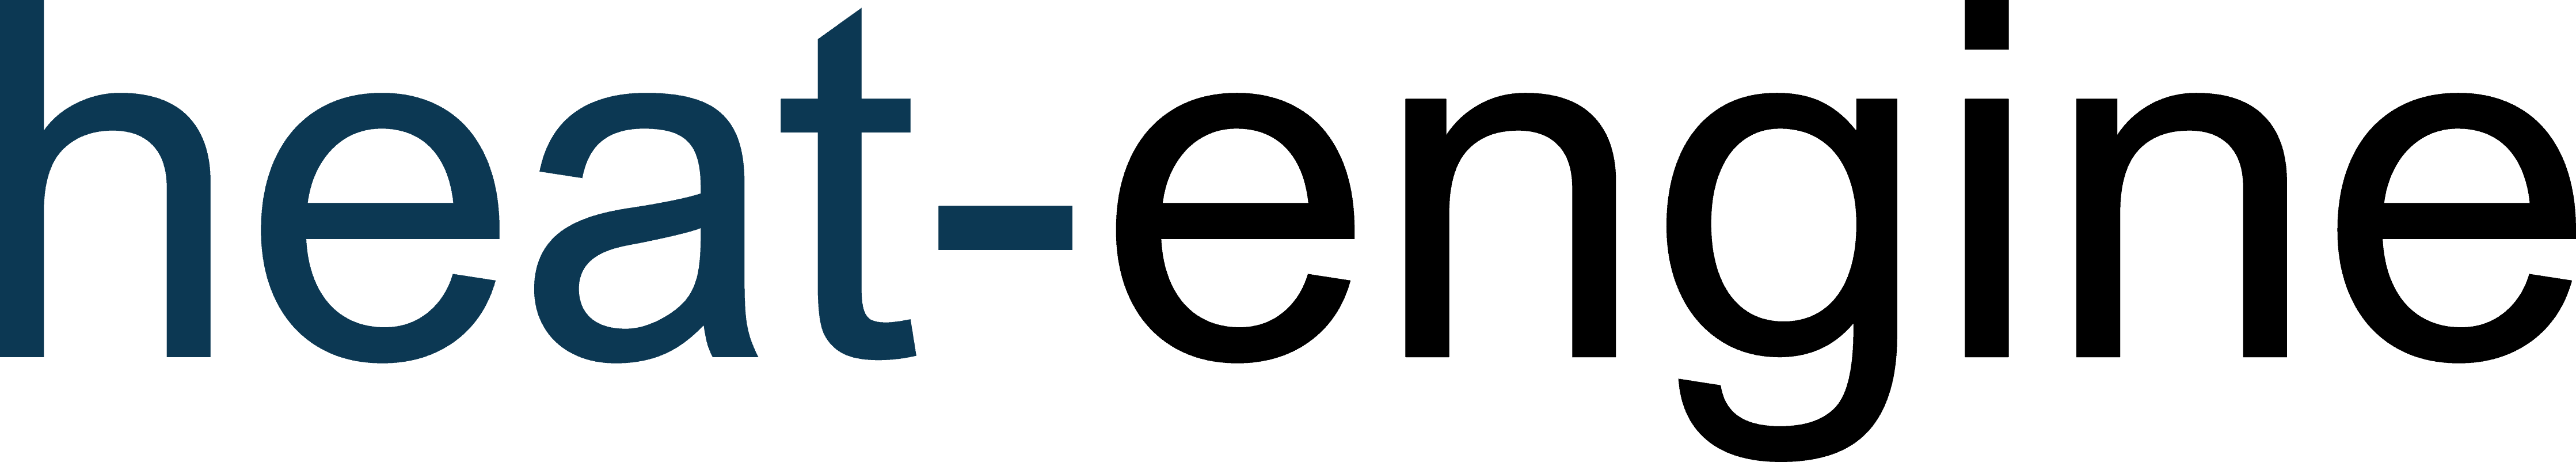 heat-engine GmbH